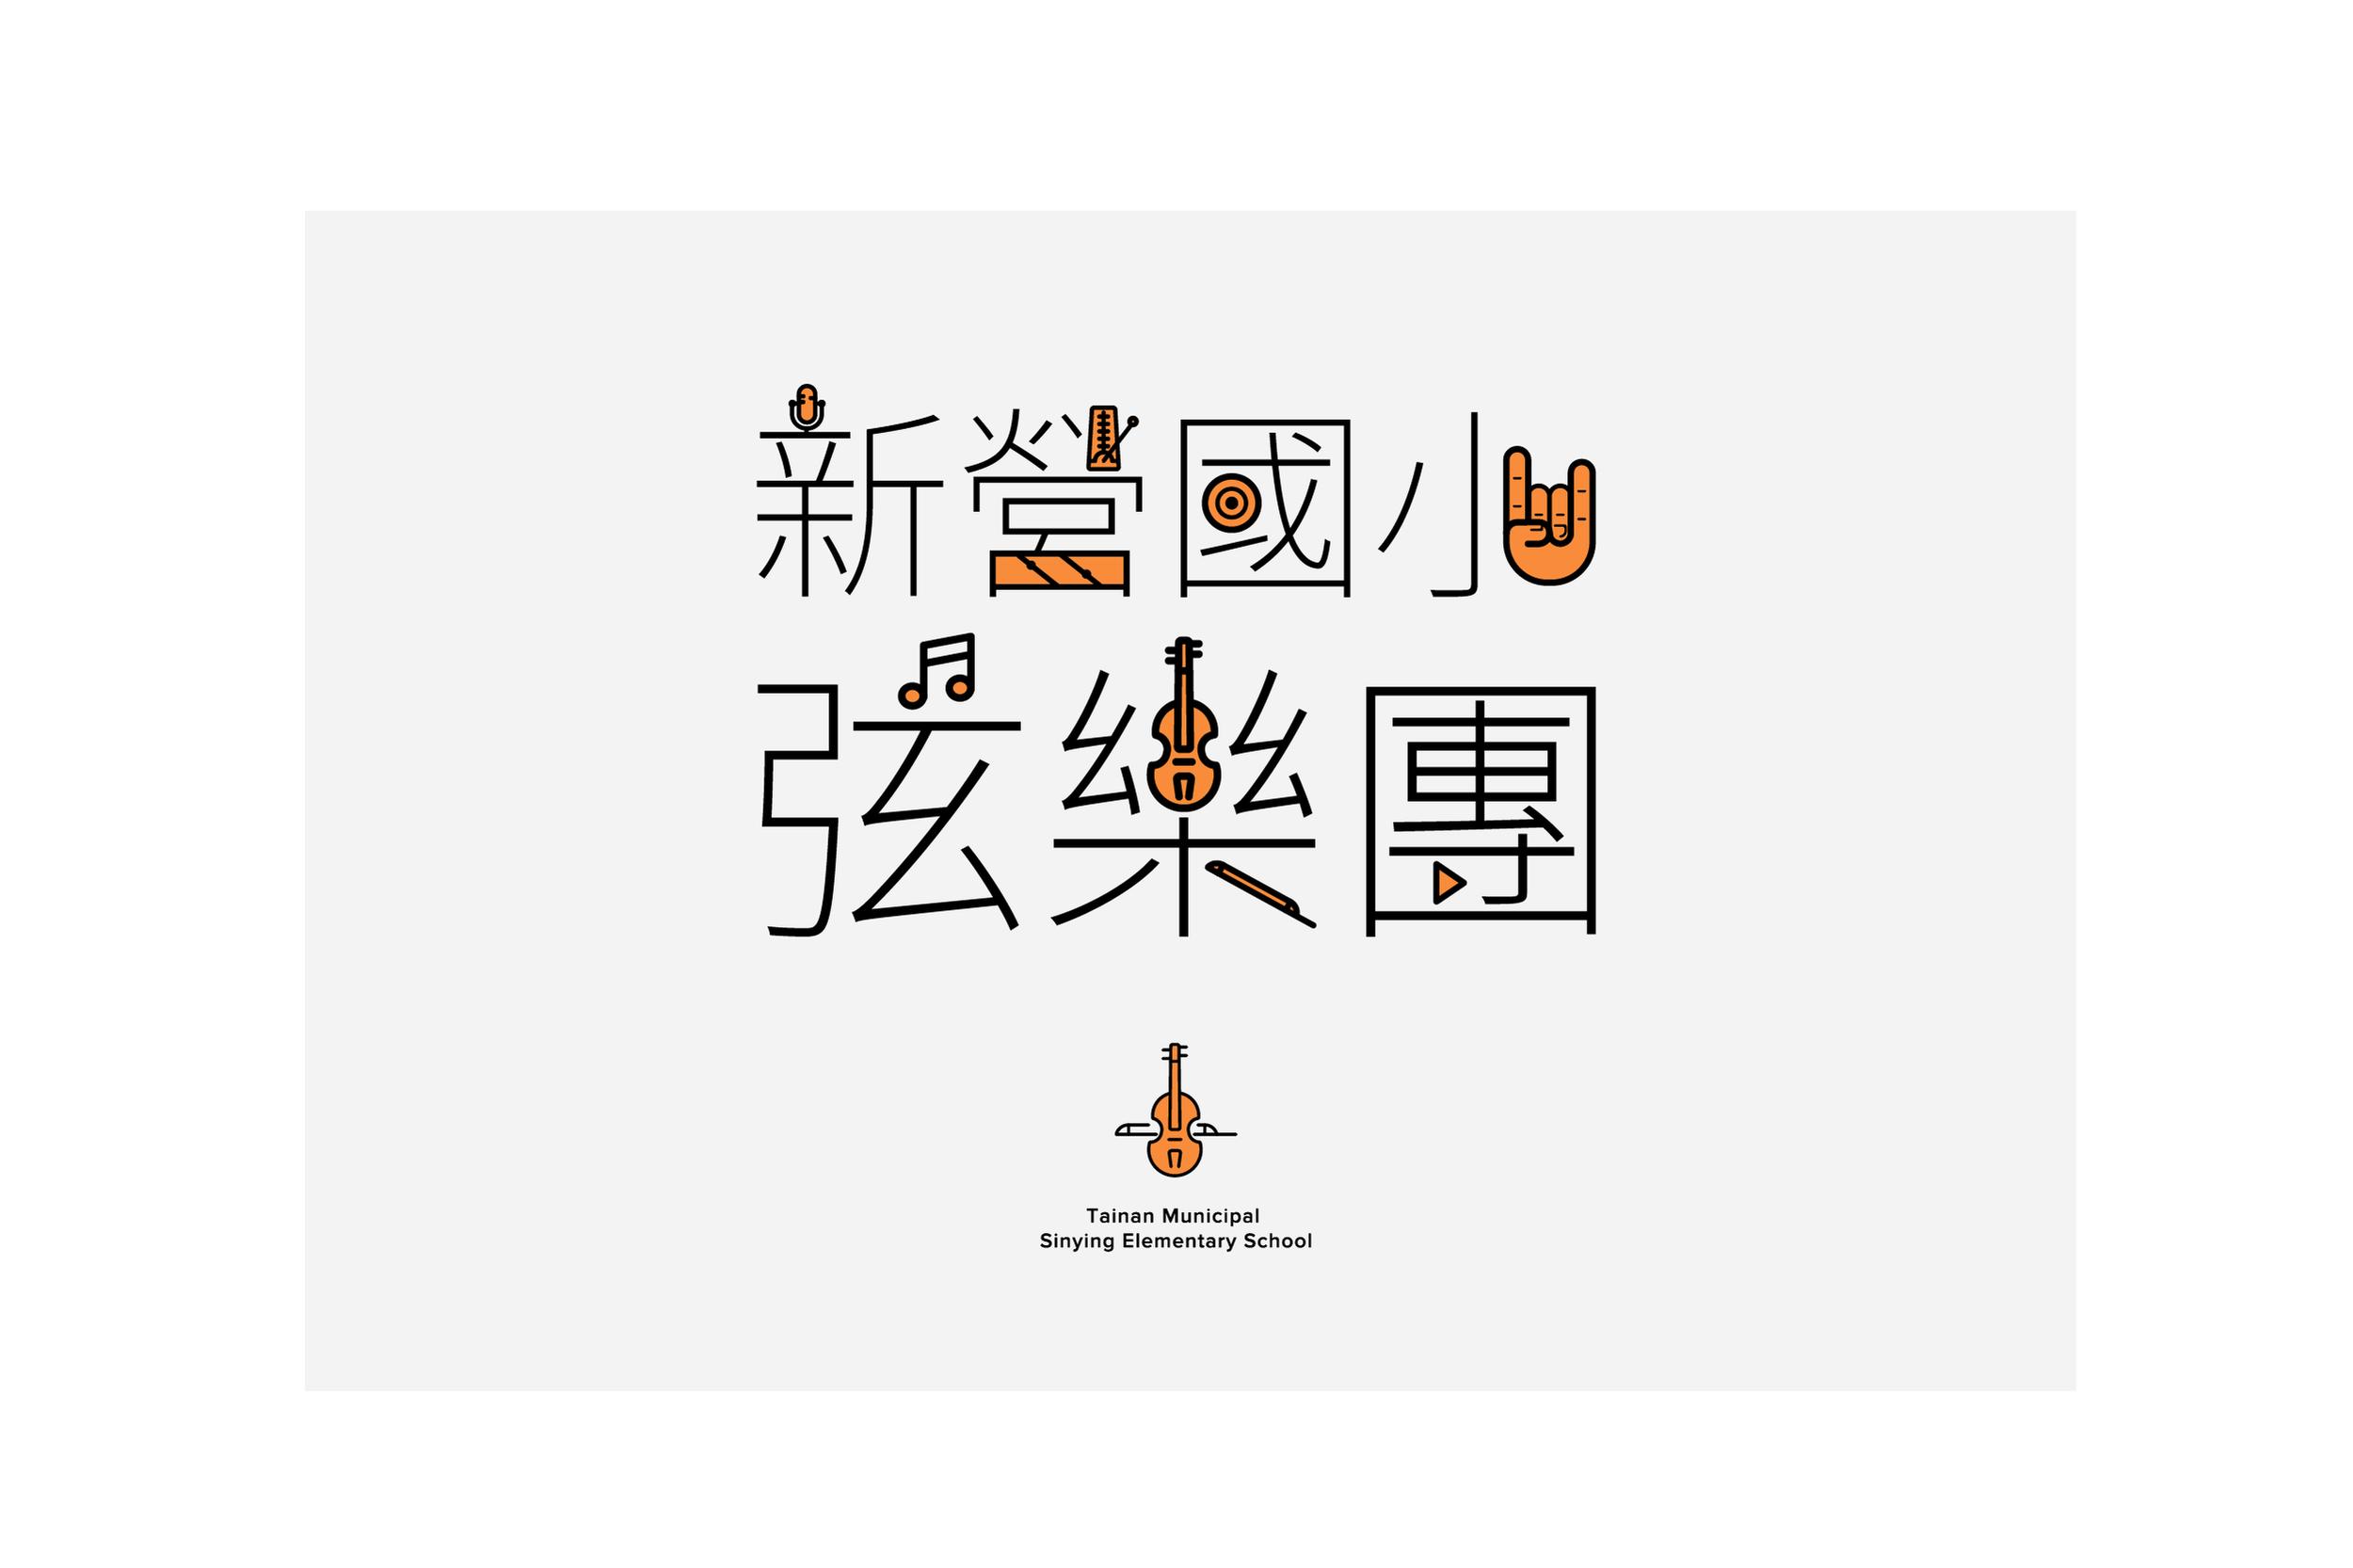 logos and marks_v4_Artboard 42.png